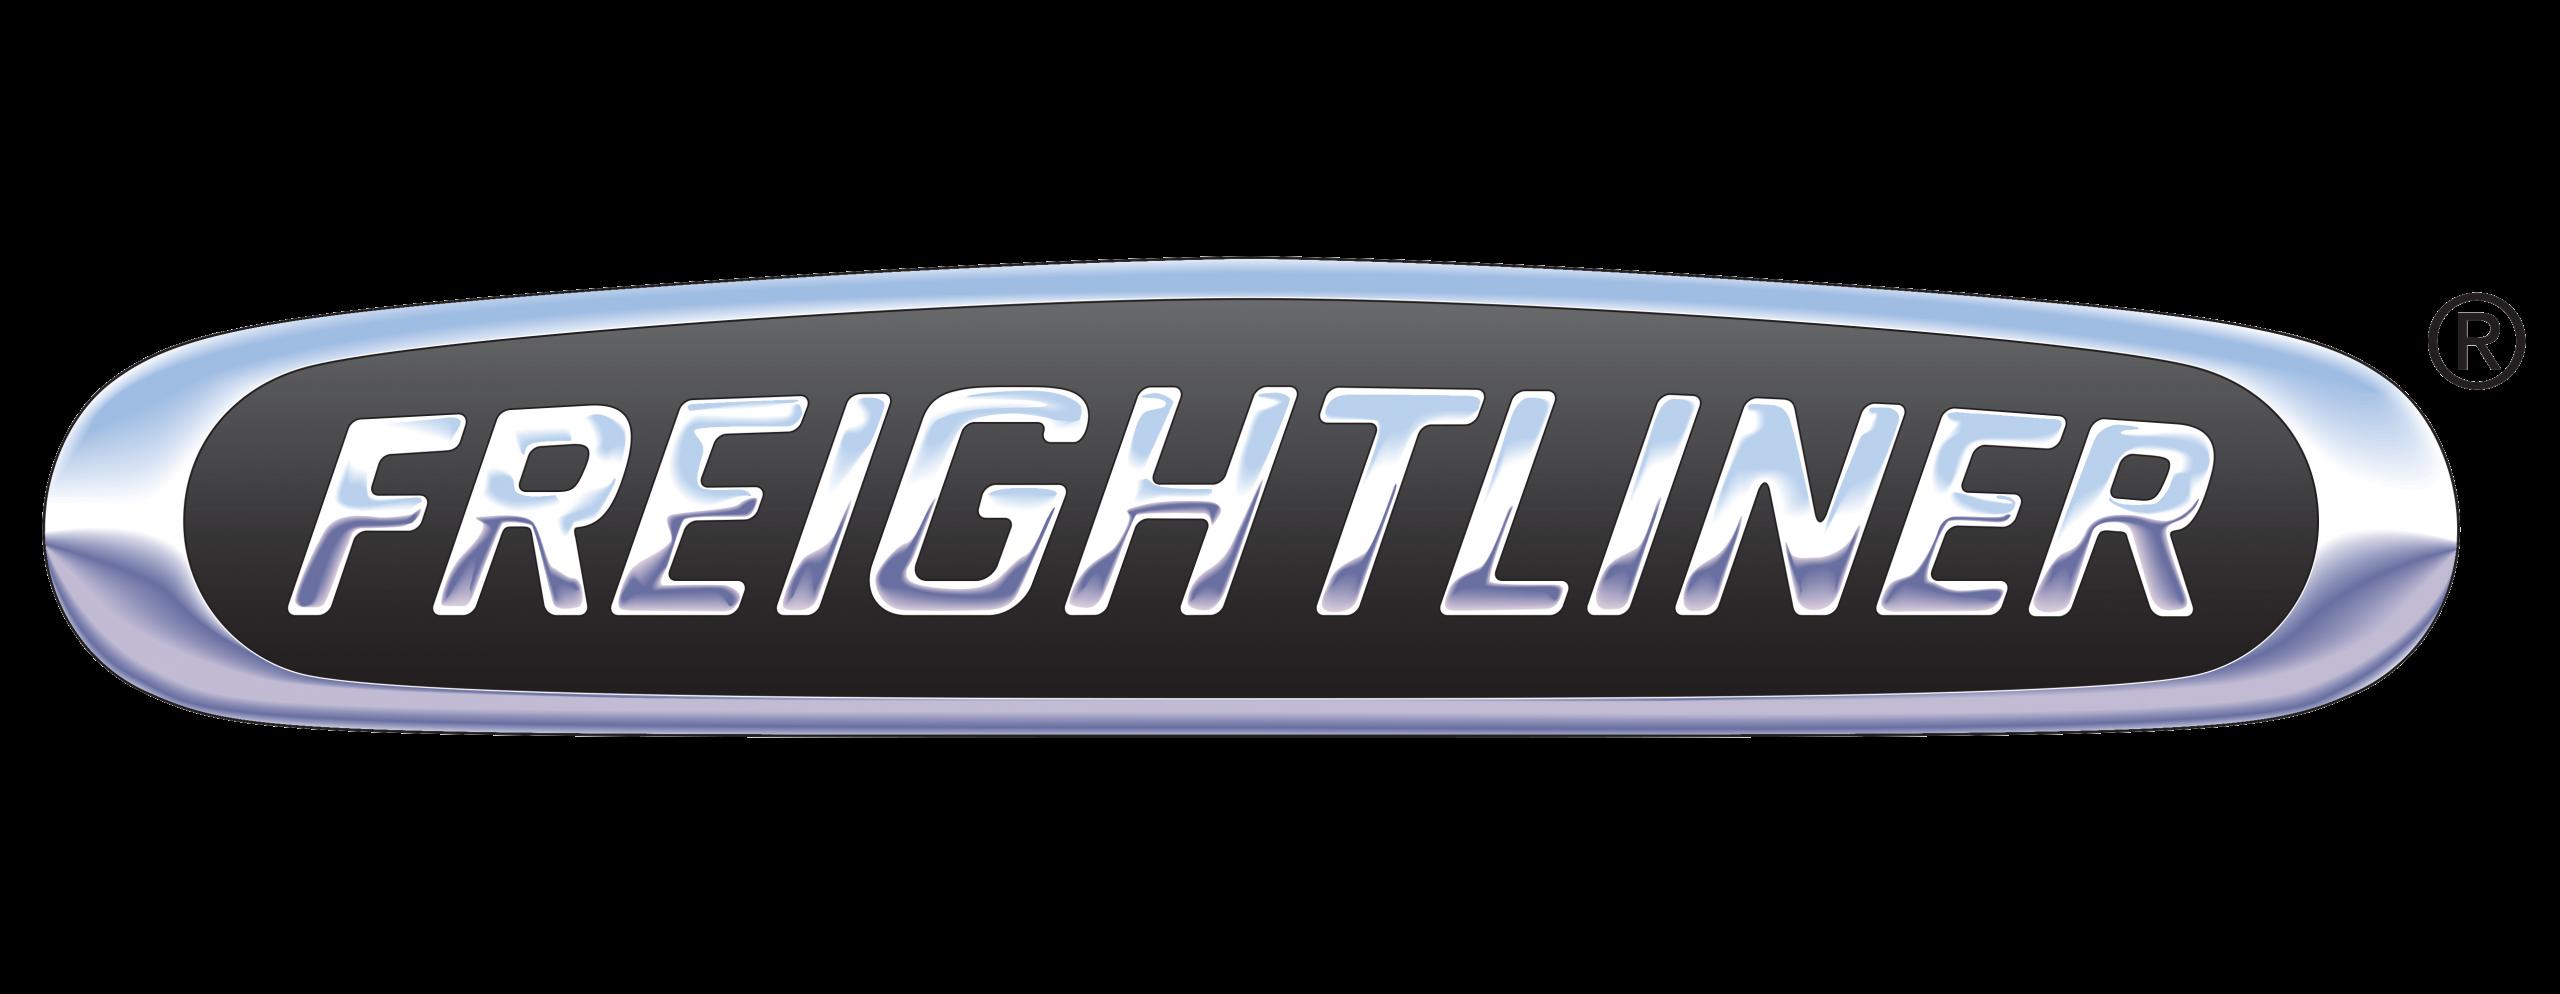 freightliner auction